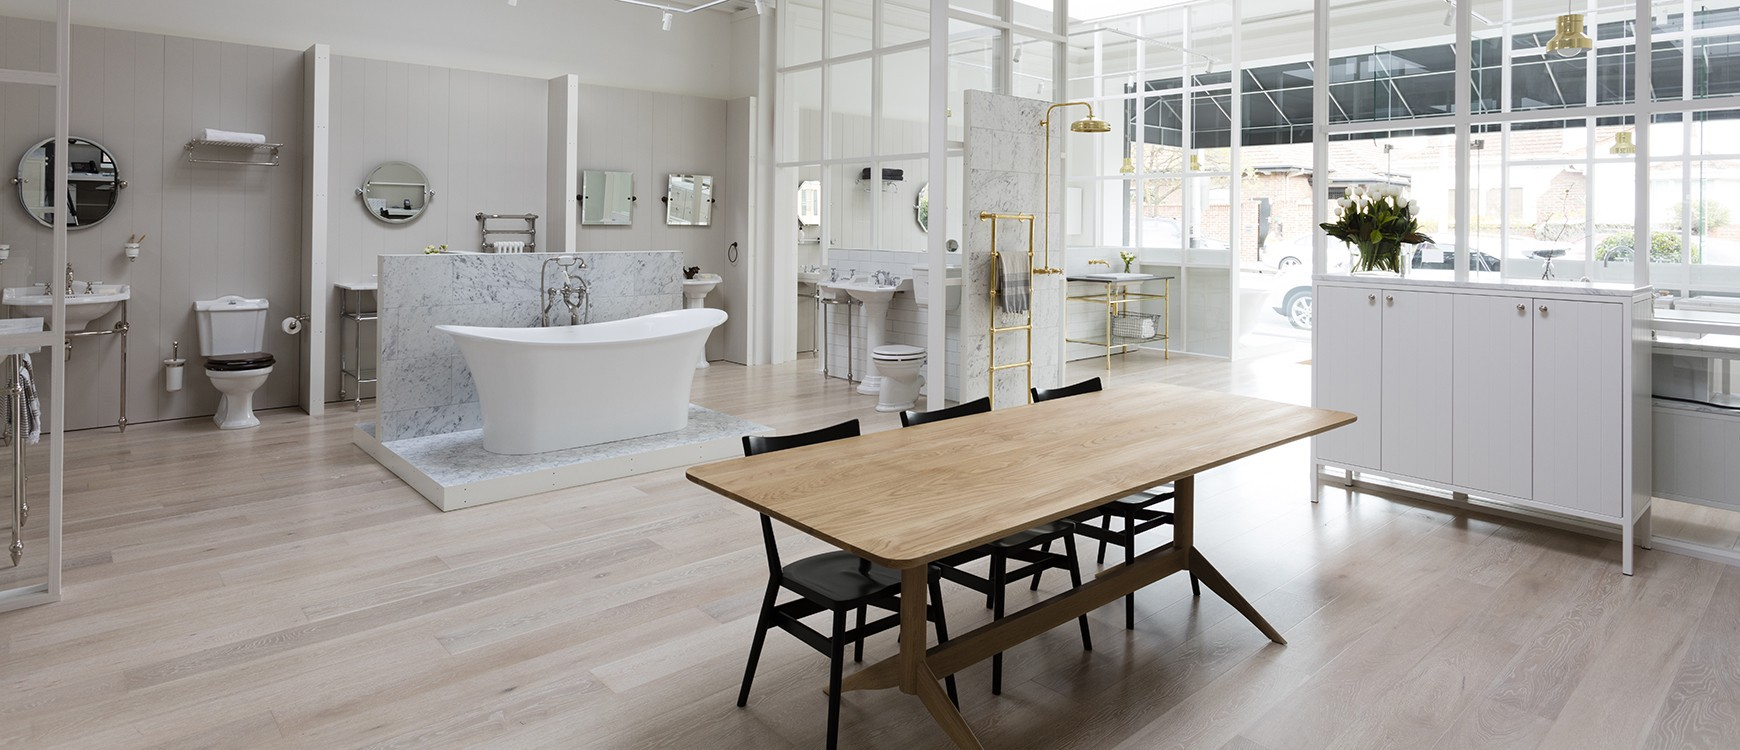 Surprising Melbourne Plumbing Showroom Traditional Premium Quality Interior Design Ideas Gentotryabchikinfo